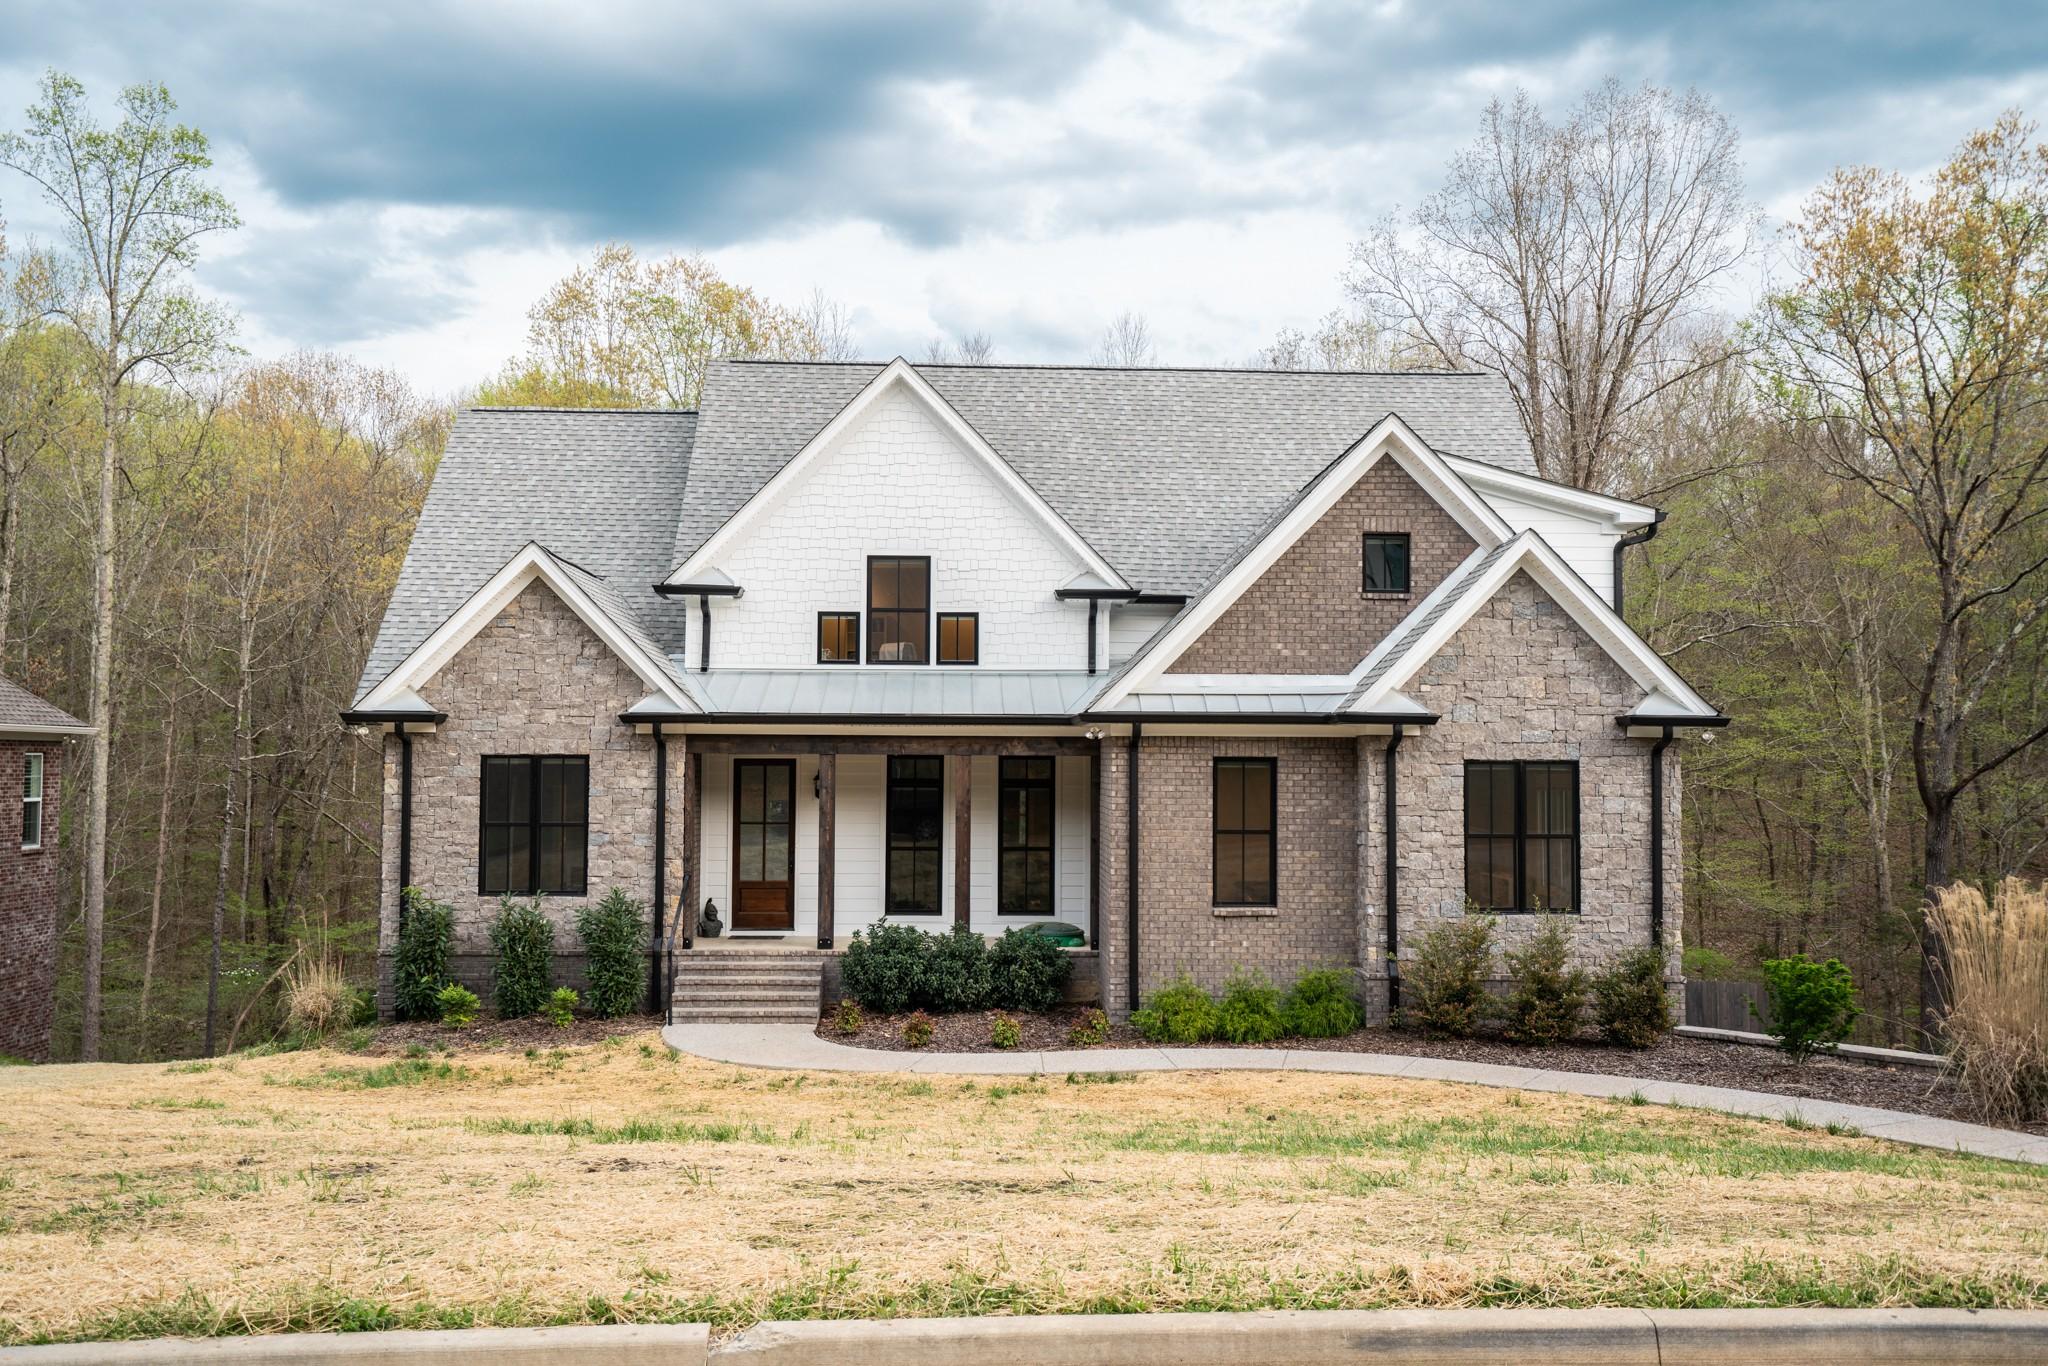 7168 Kyles Creek Dr, Fairview, TN 37062 - Fairview, TN real estate listing